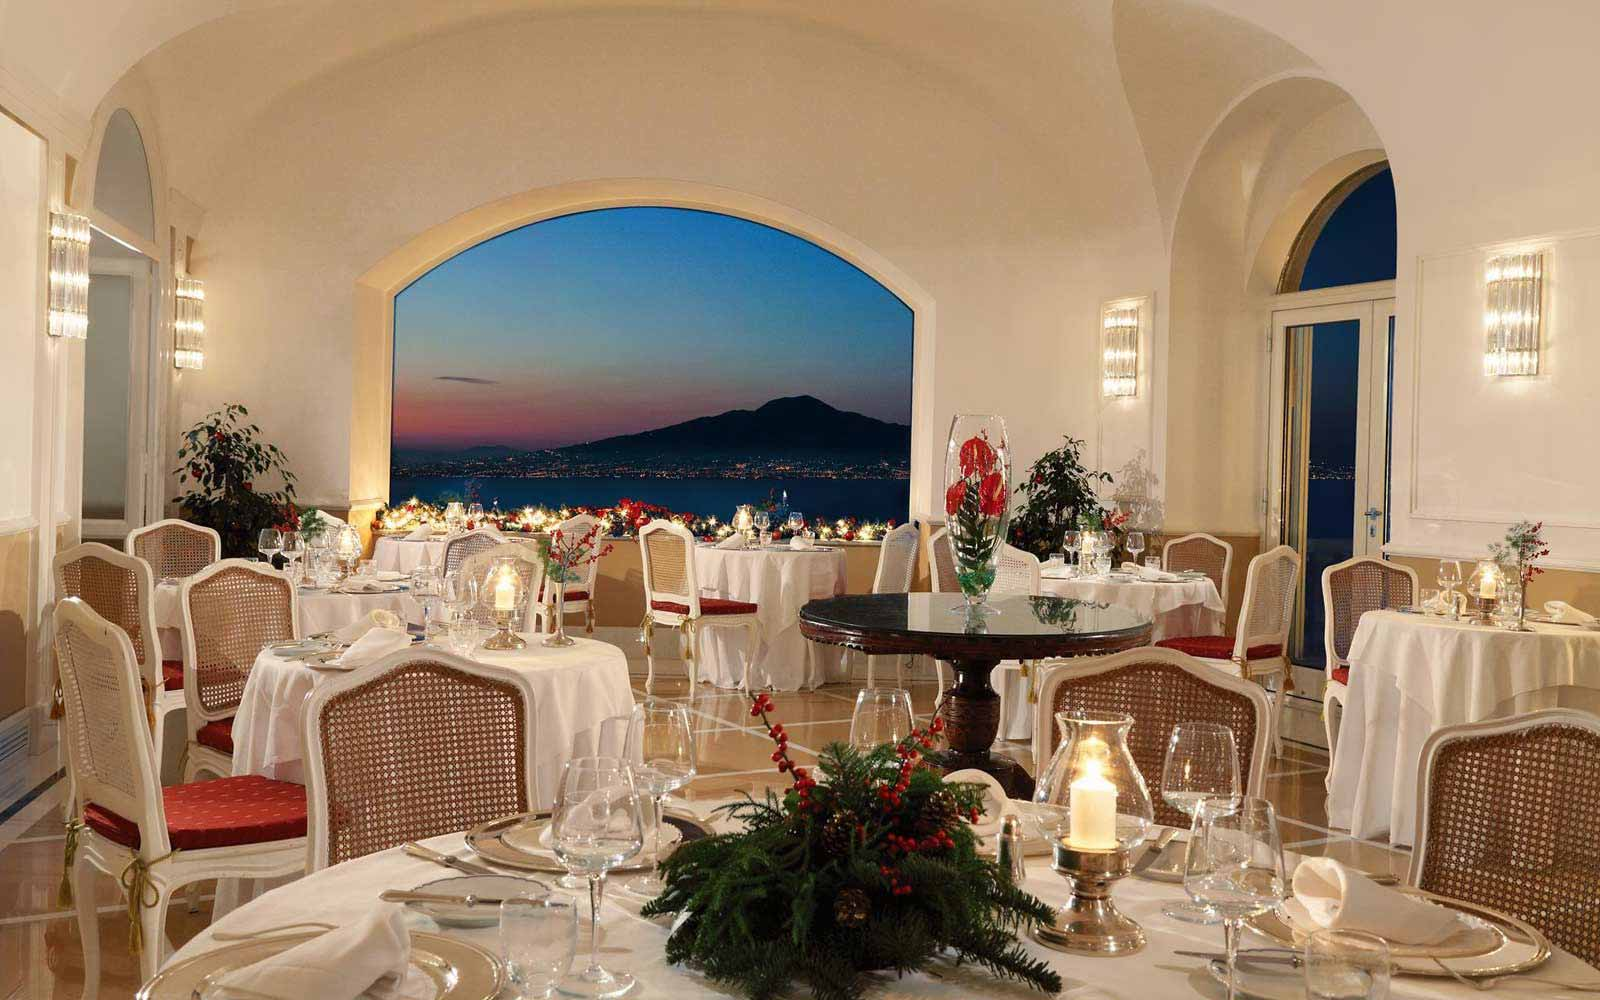 Terrazza Bosquet restaurant at the Grand Hotel Excelsior Vittoria